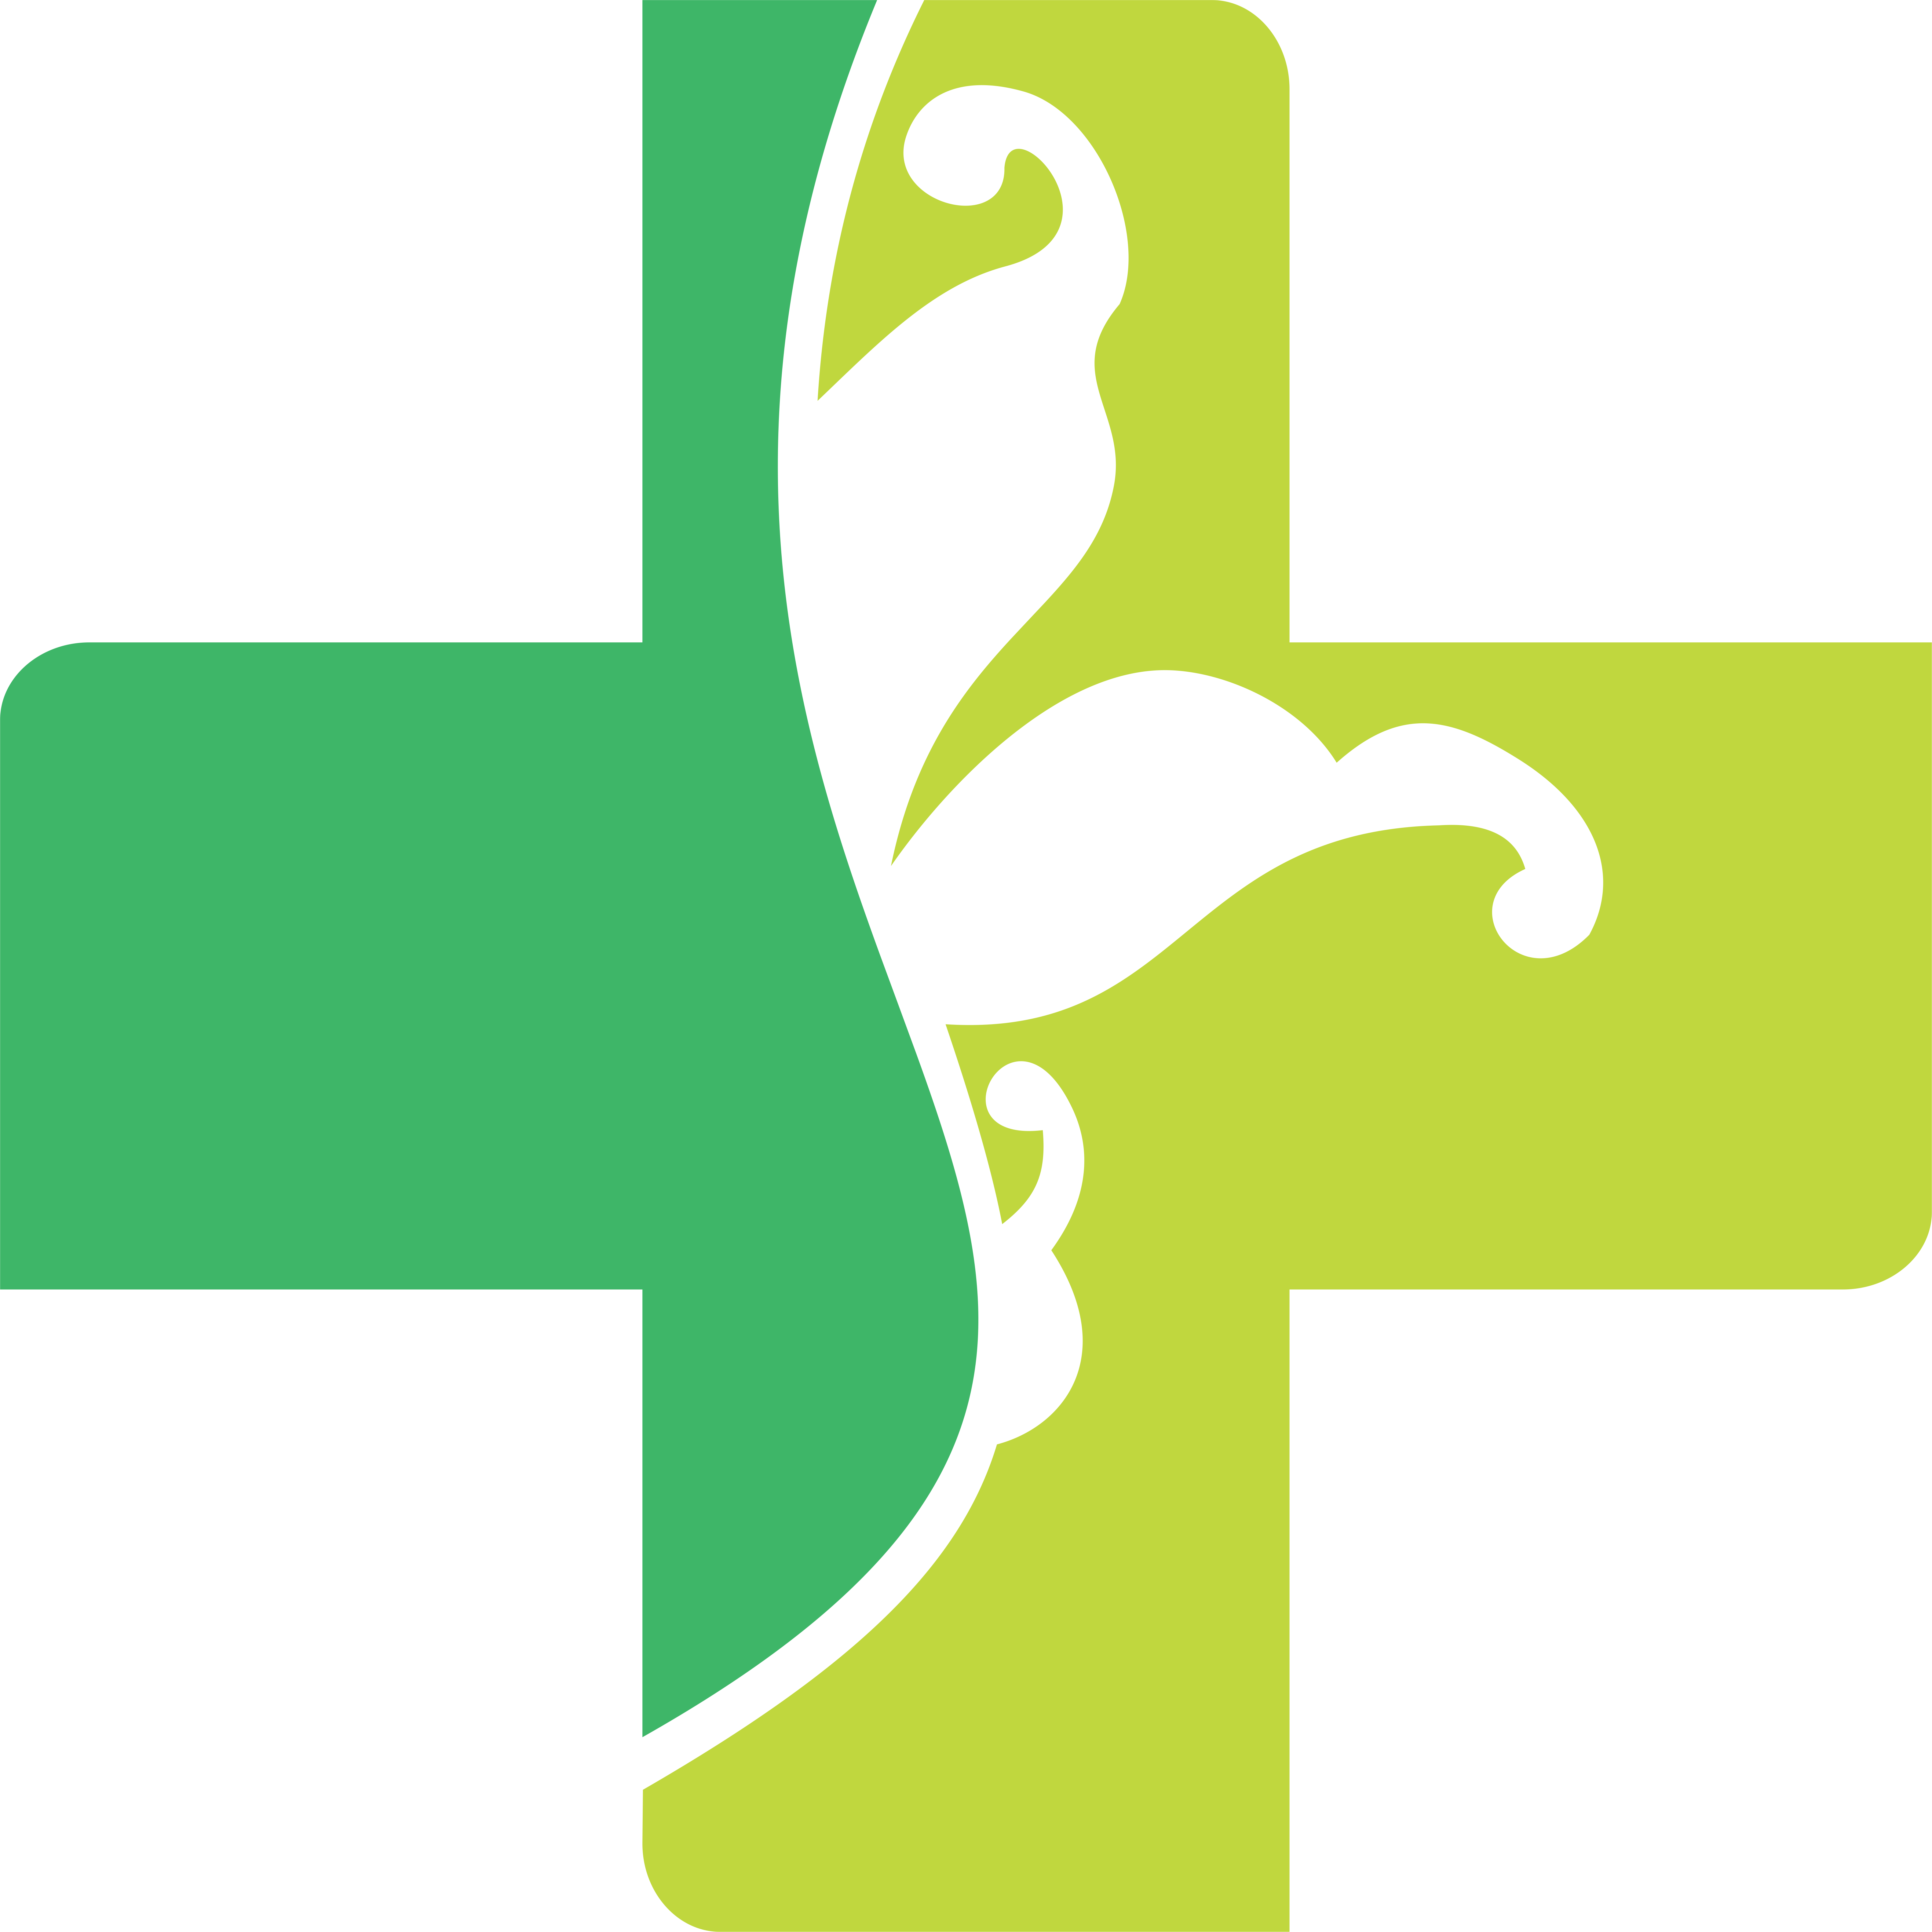 Rumah Sakit Umum Daerah Panembahan Senopati